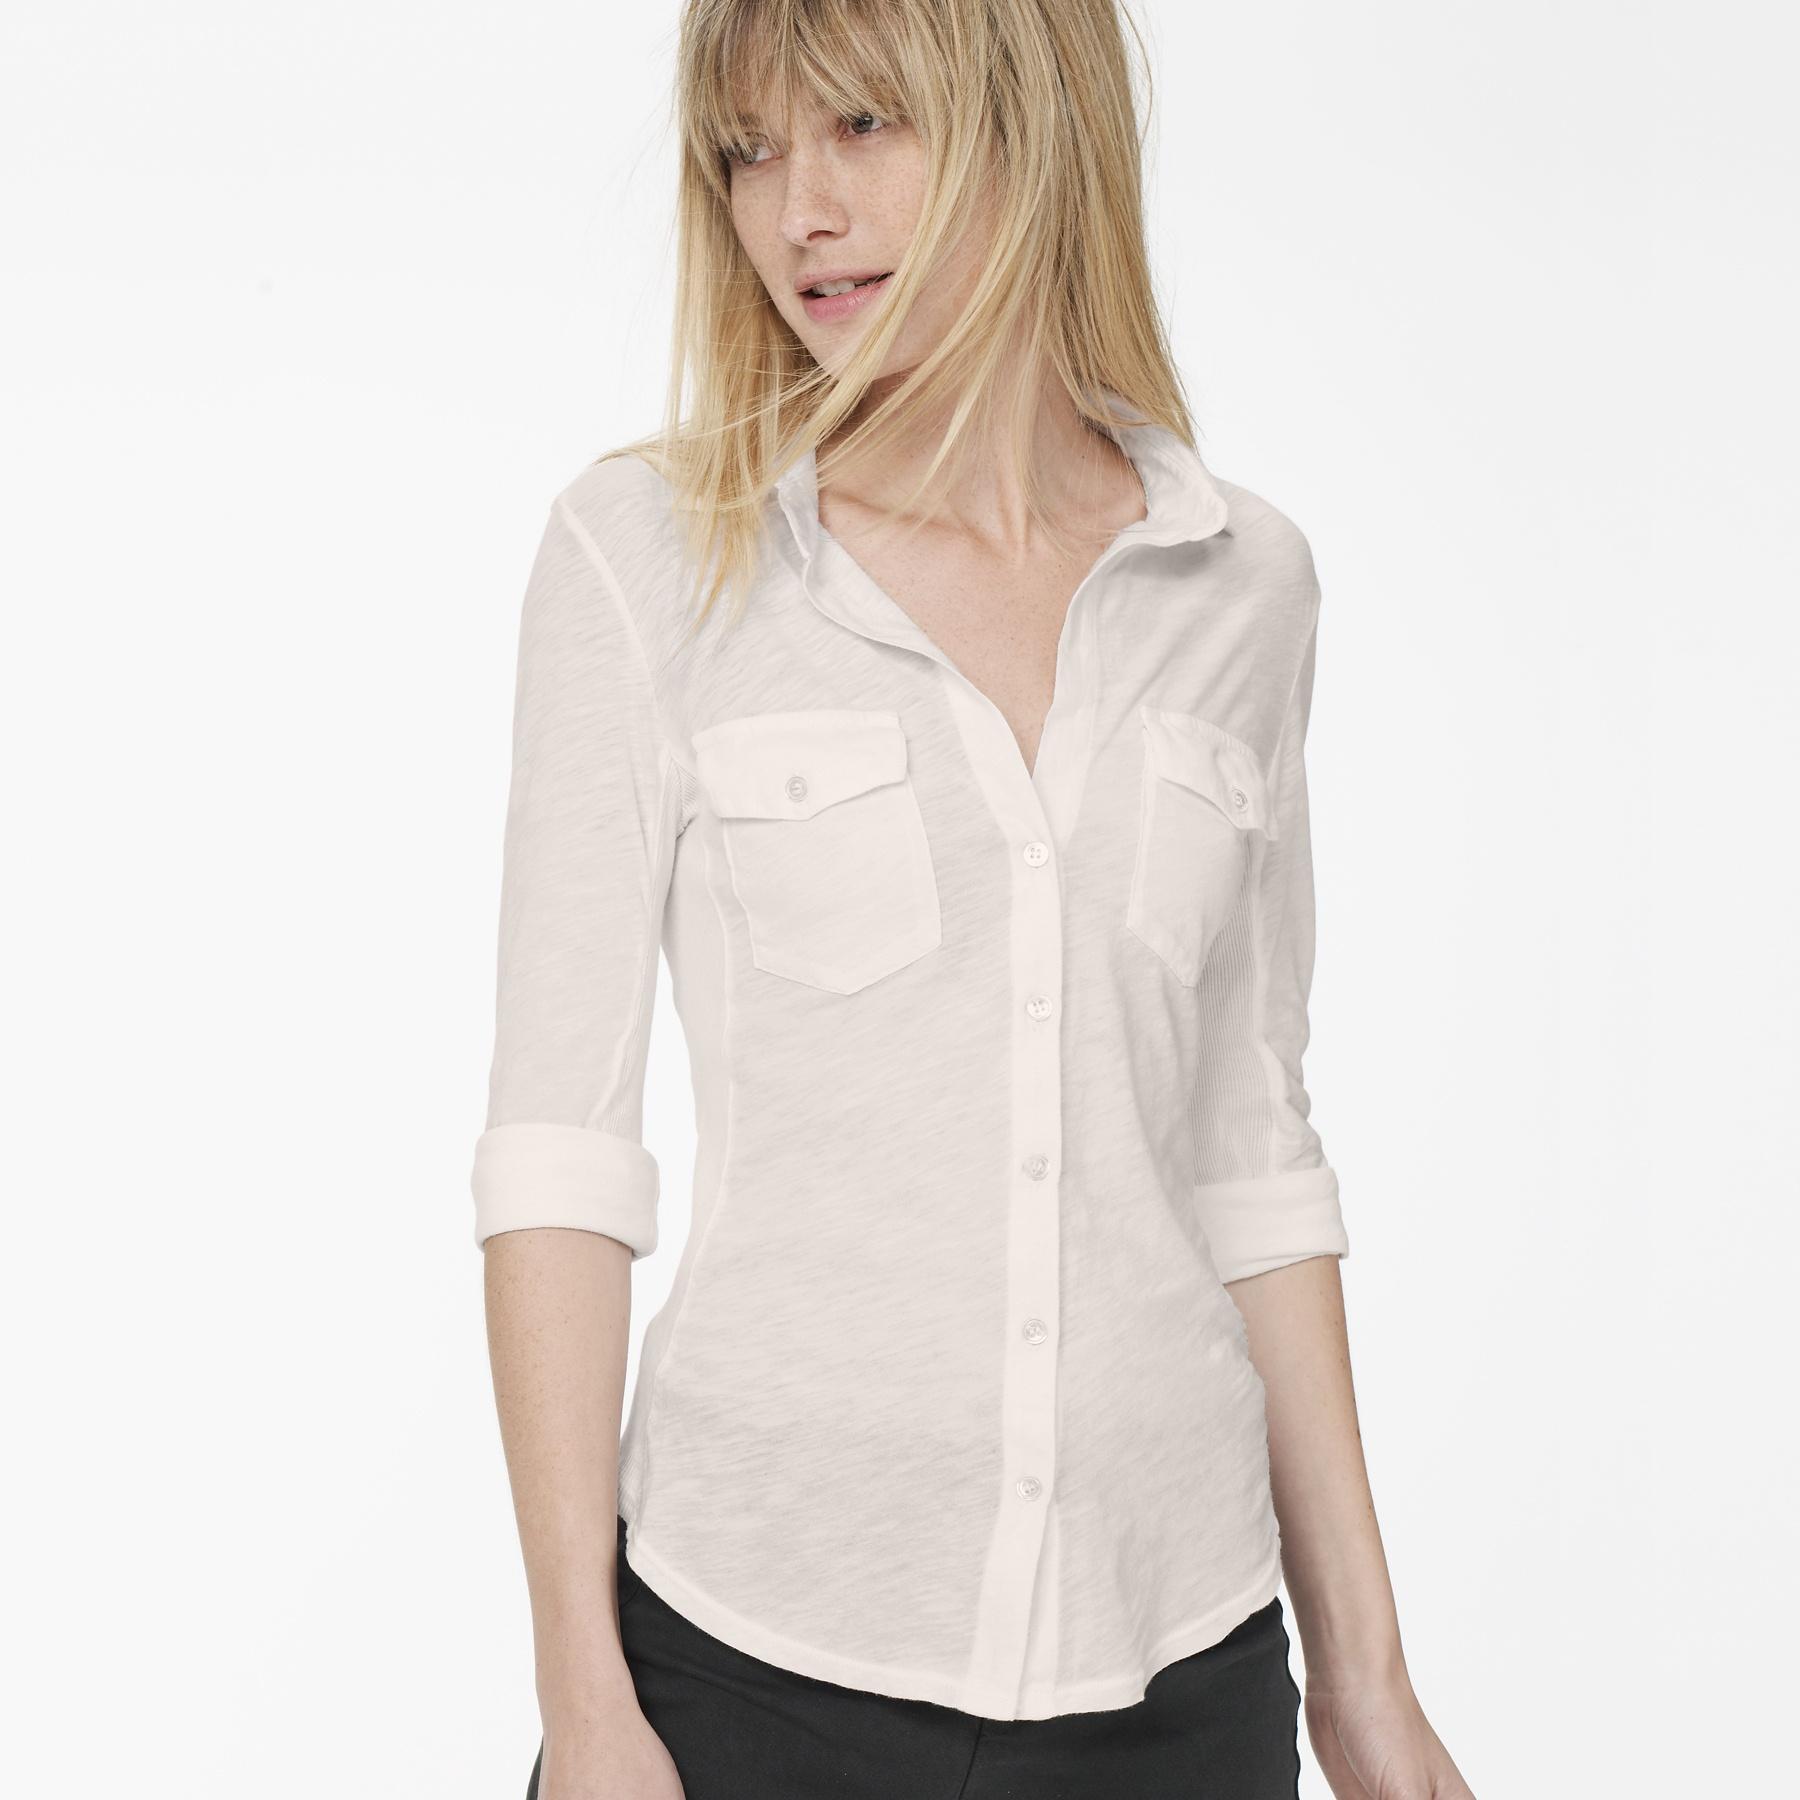 James Perse Sheer Slub Side Panel Shirt In White Lyst